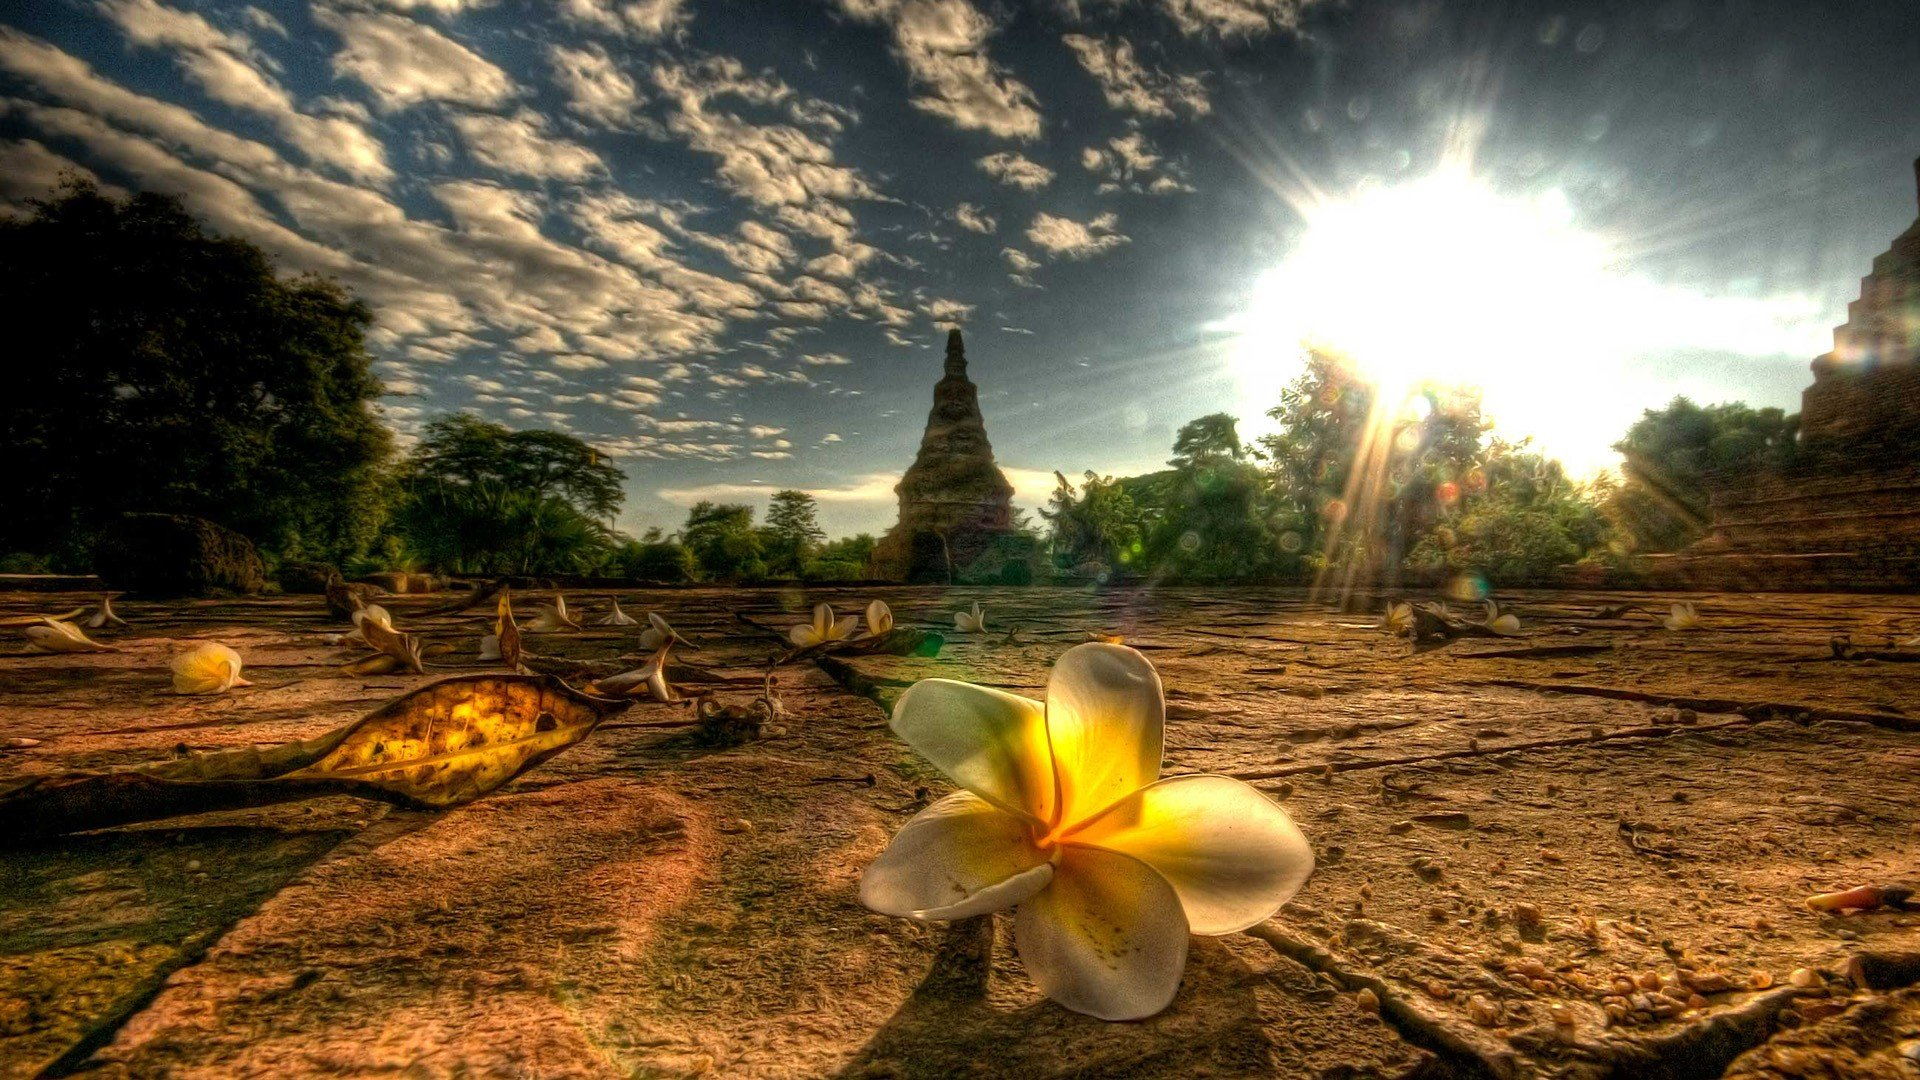 43 Thailand Wallpaper Desktop On Wallpapersafari